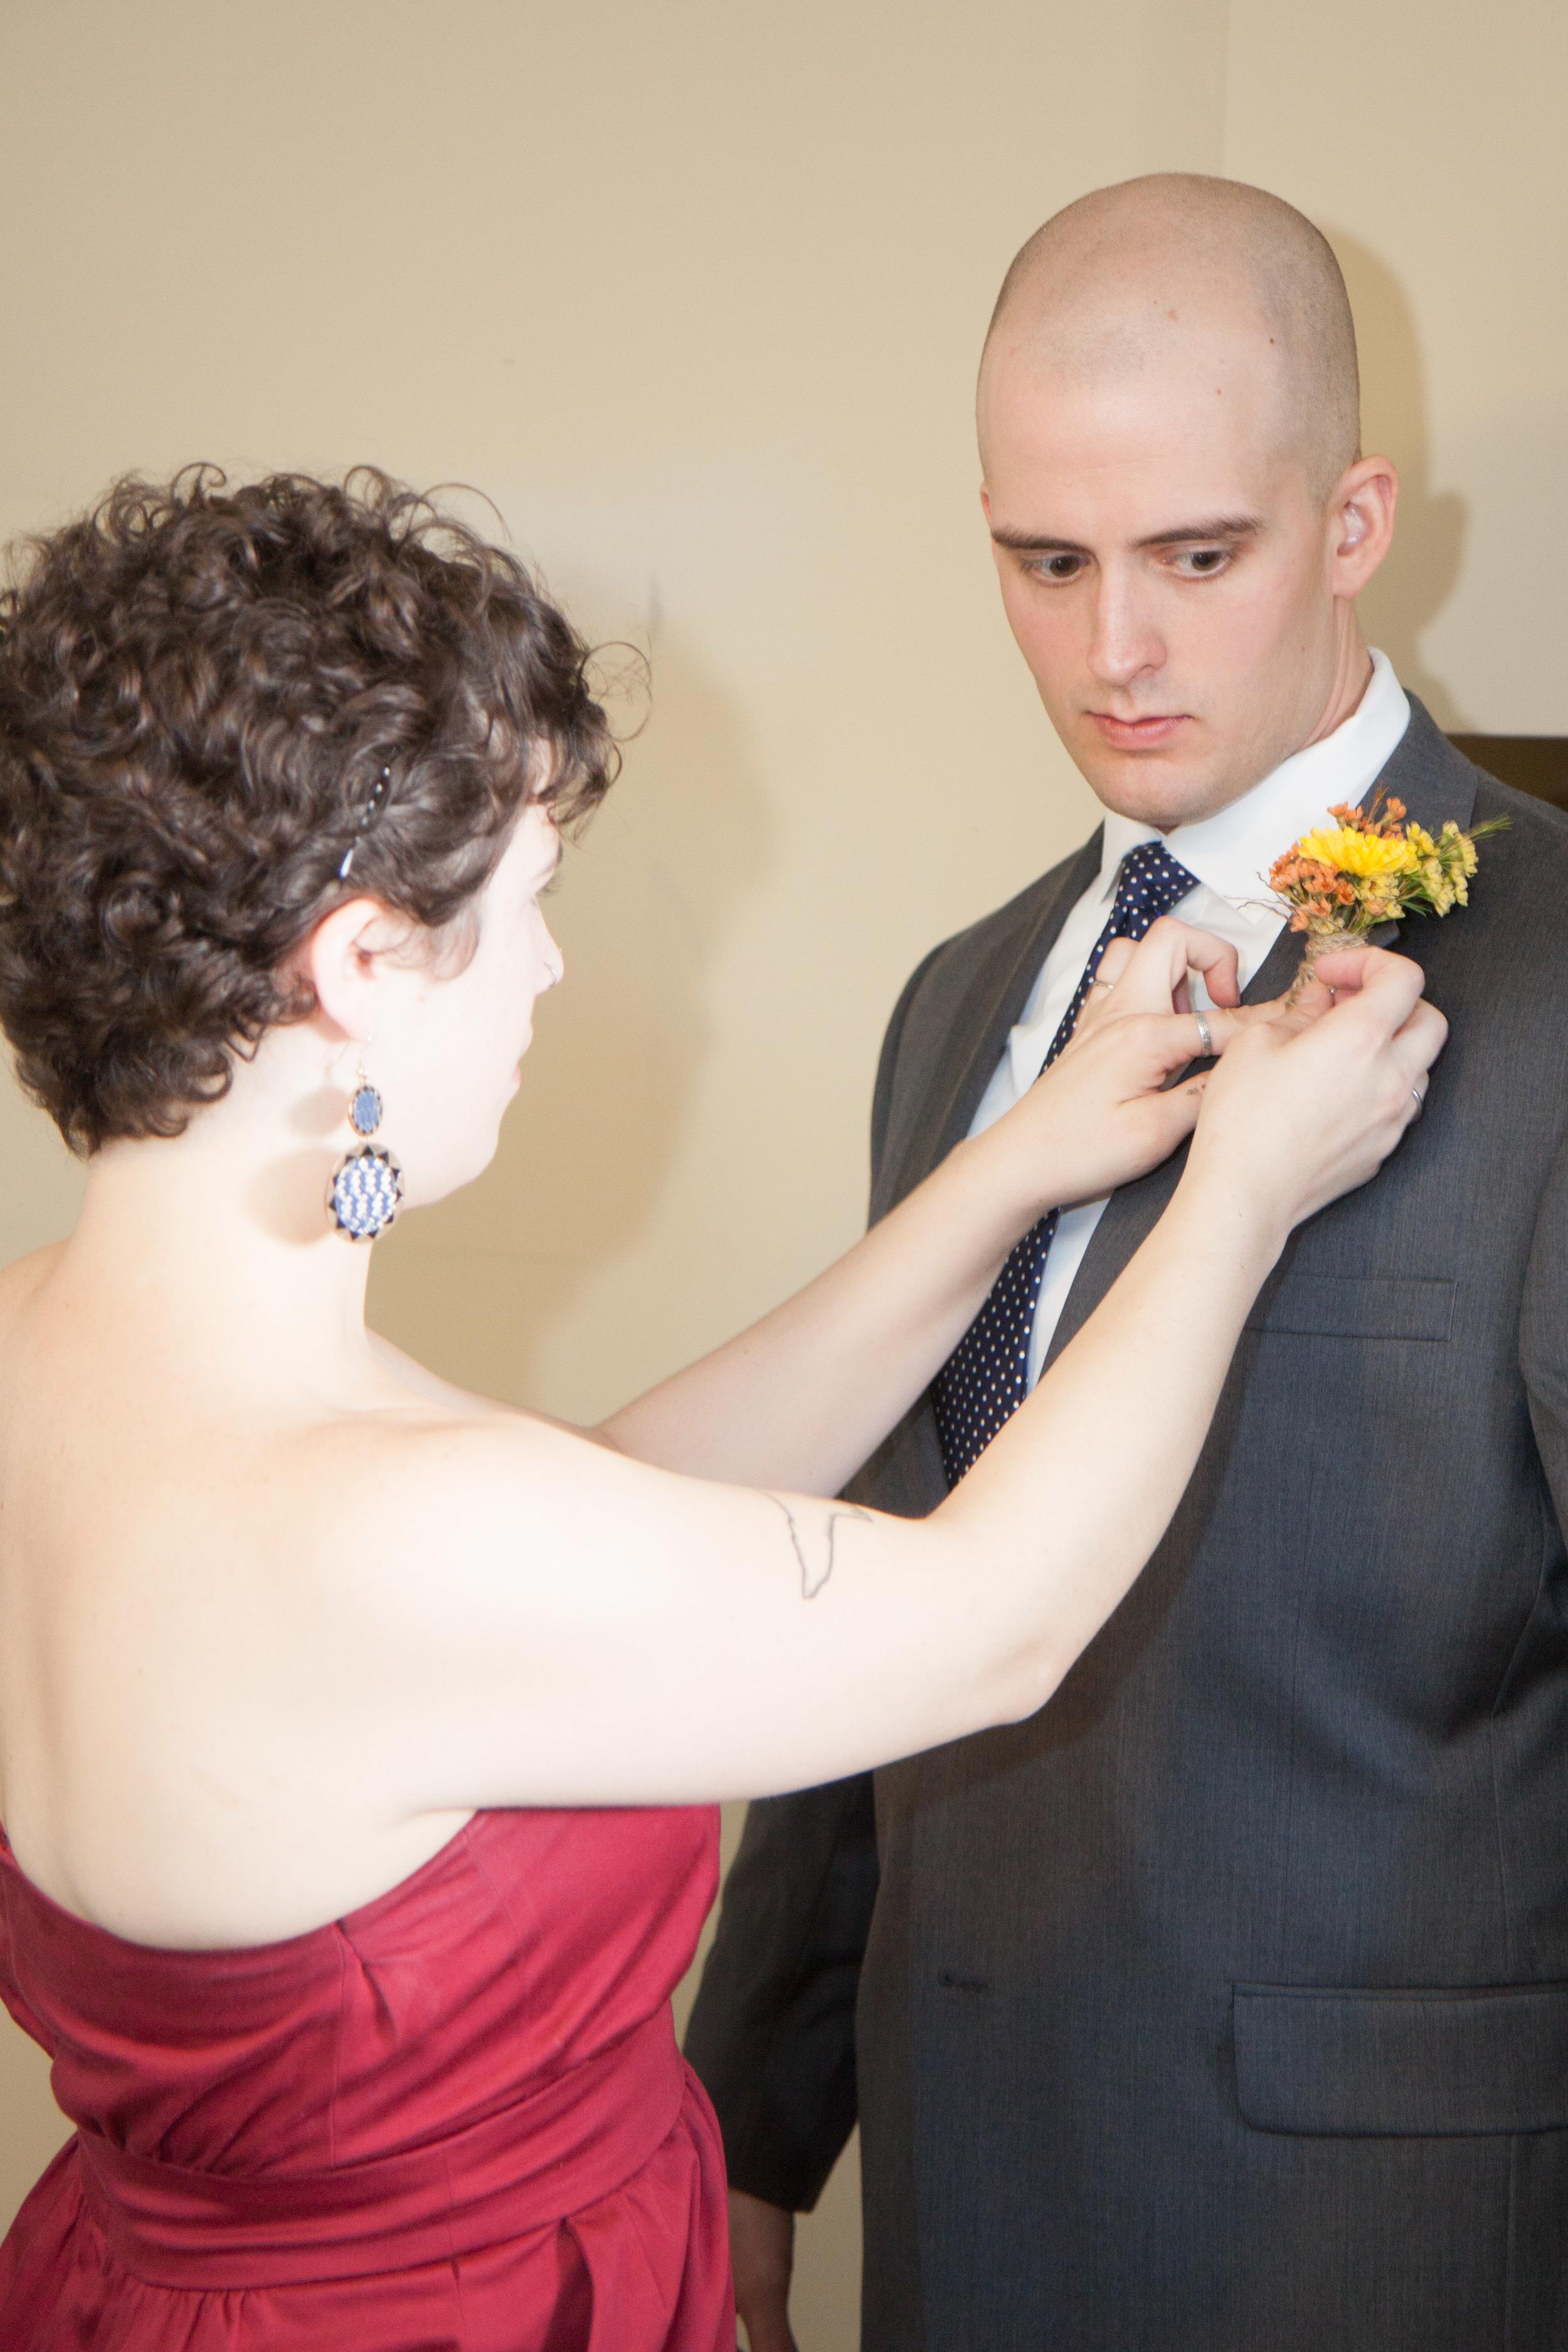 Wilson Bickel Wedding - Reception and Ceremony (66 of 526).jpg